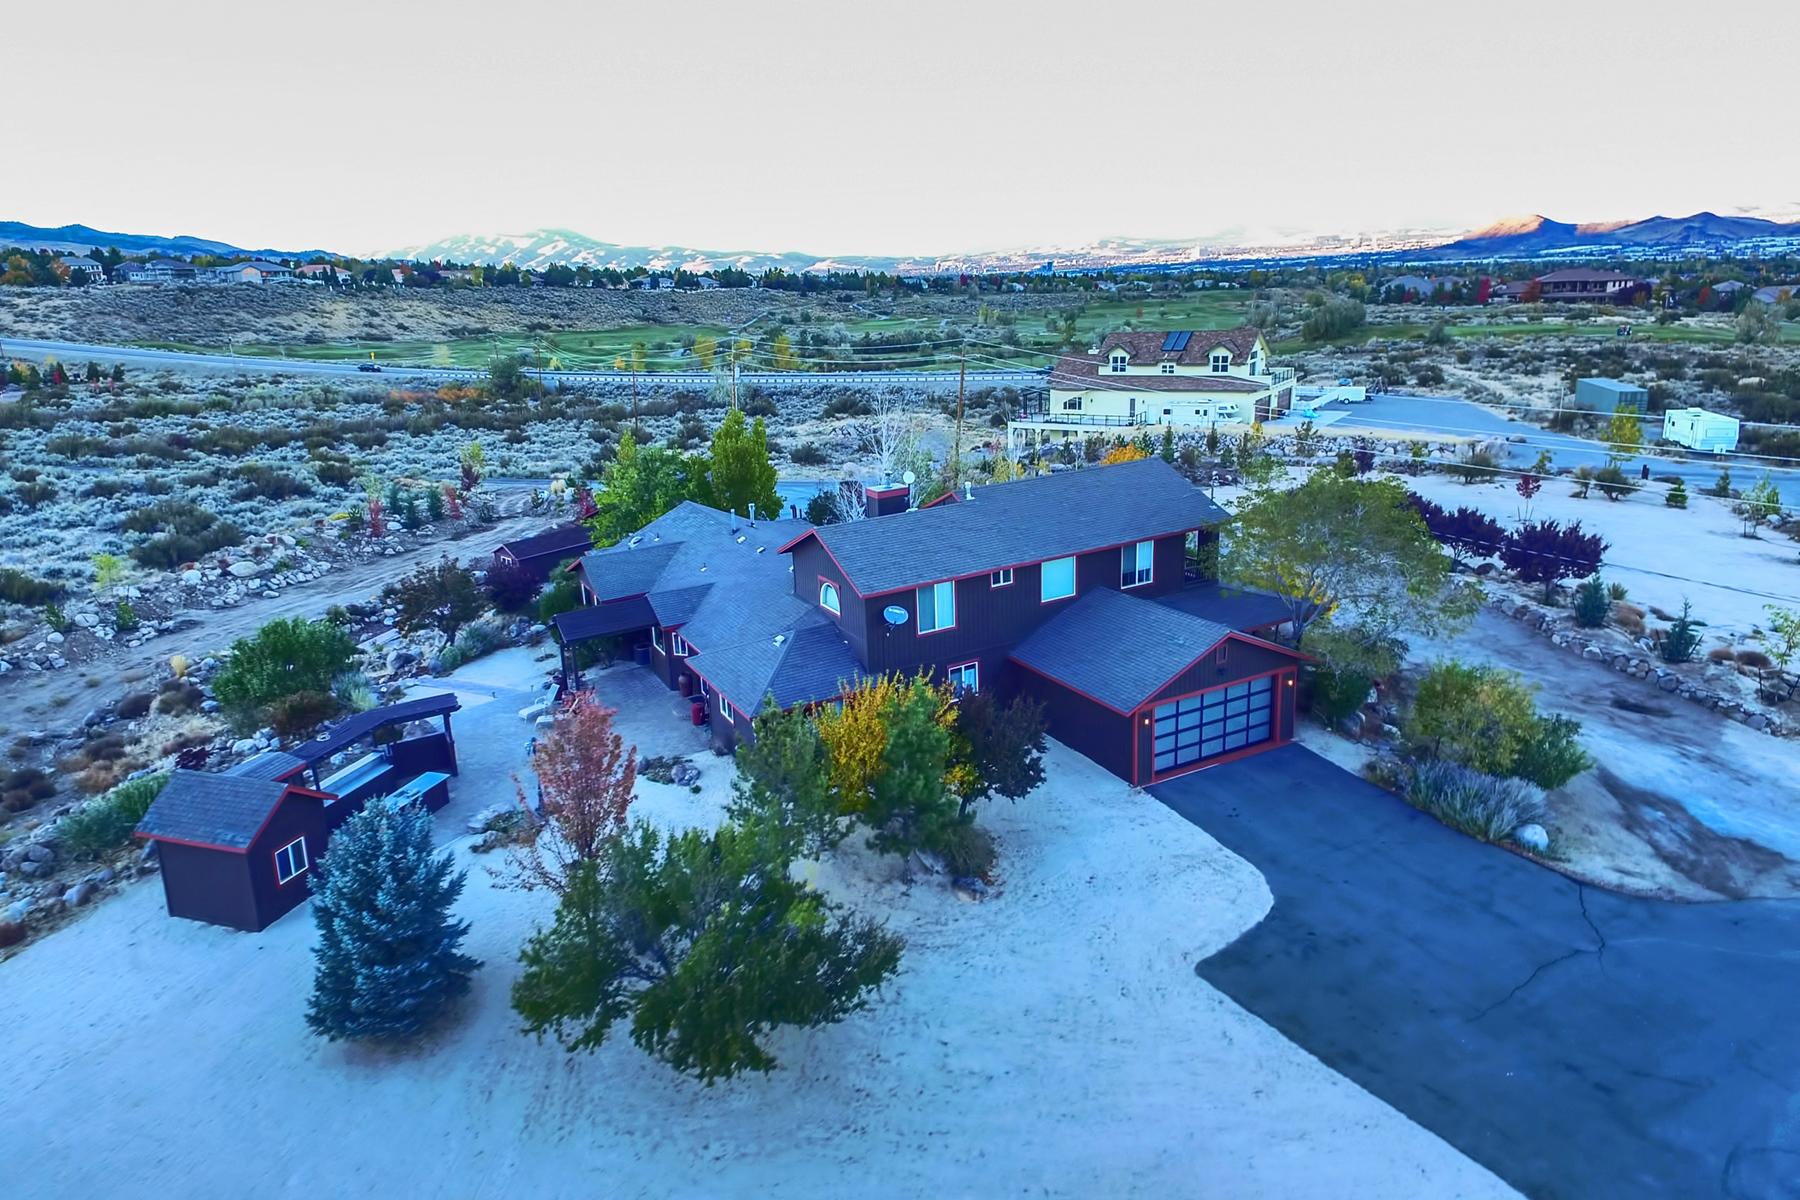 Additional photo for property listing at 14095 Torvinen Way, Reno, Nv 89511 14095 Torvinen Way Reno, Nevada 89511 United States